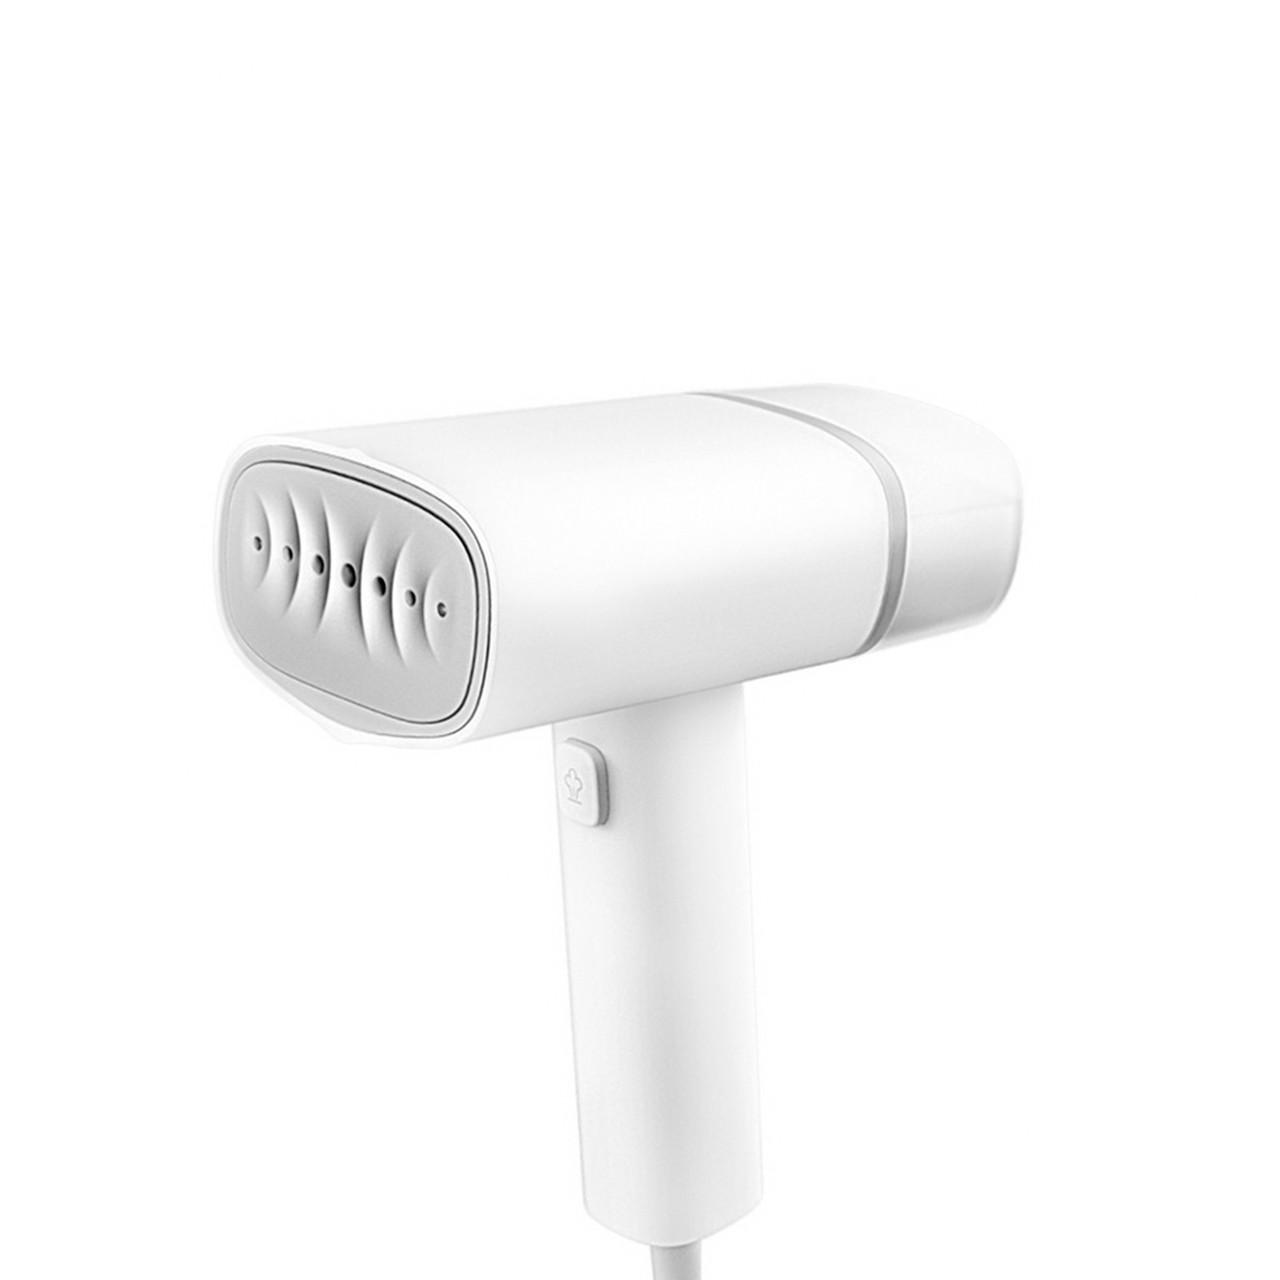 Ручной отпариватель Xiaomi Mijia Zanjia Garment Steamer (GT-301W), White